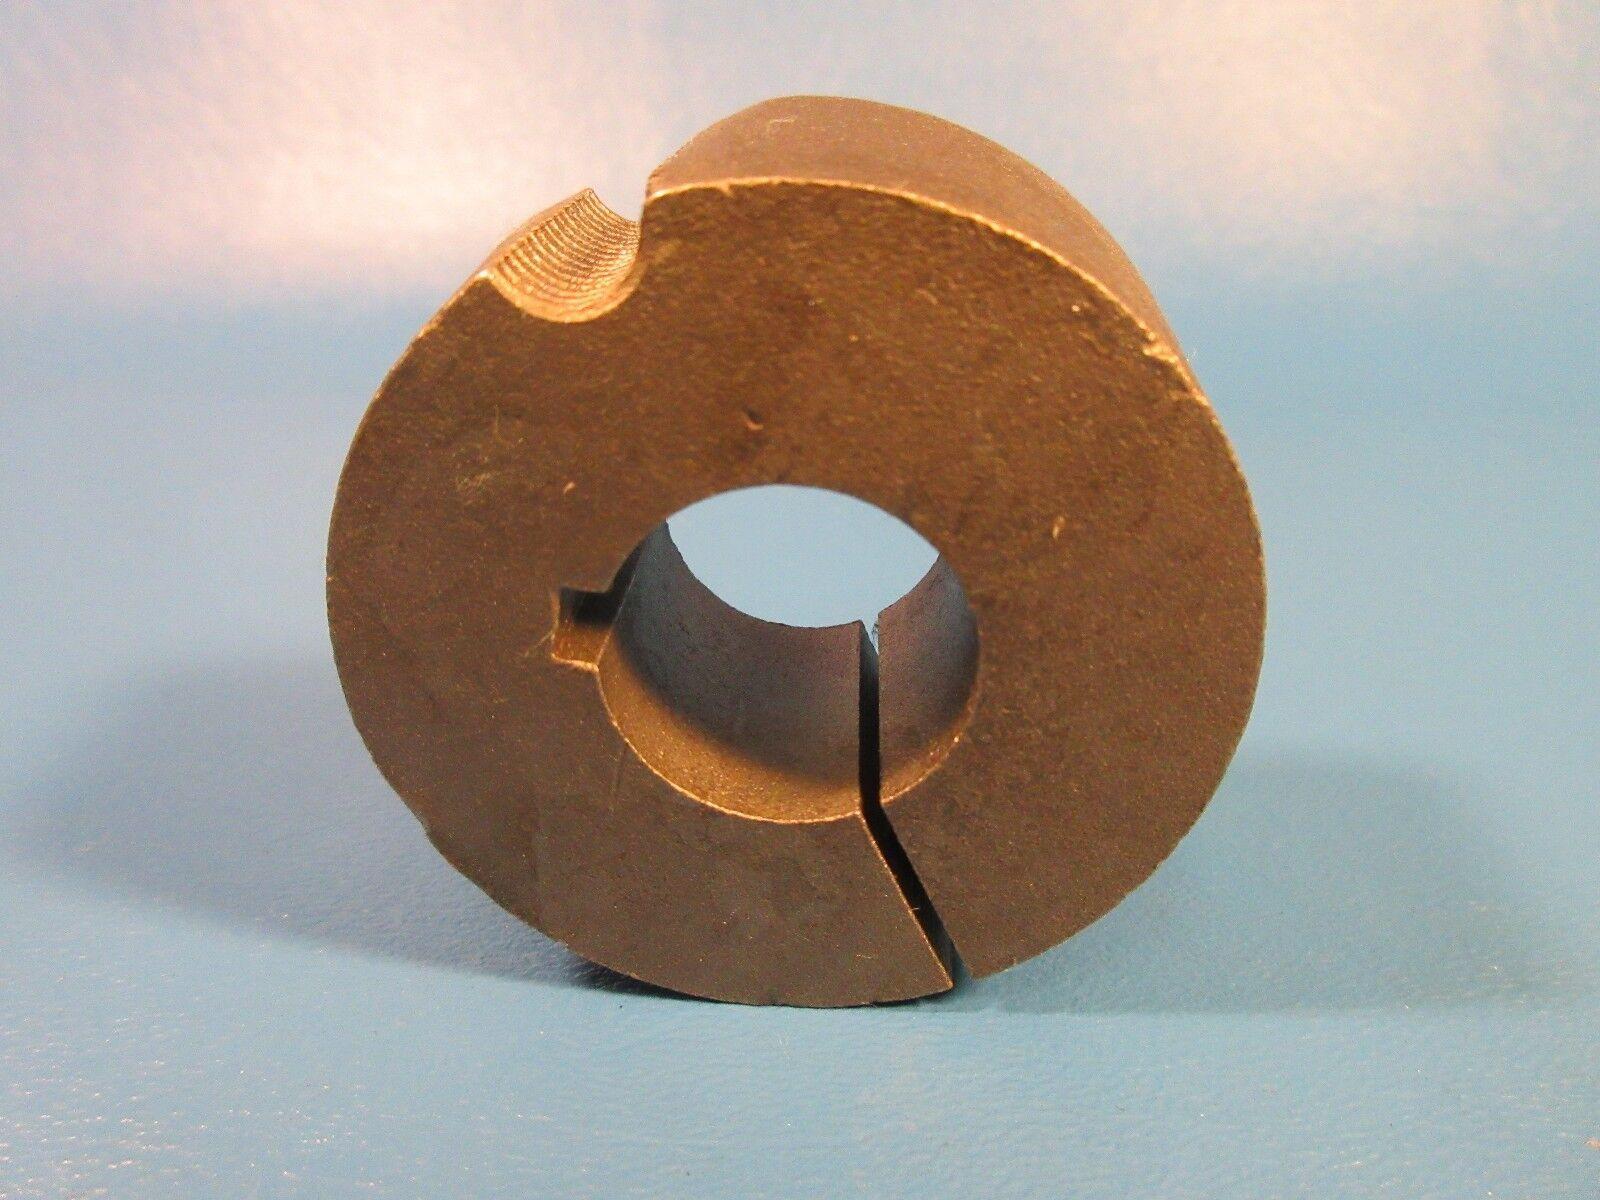 1610//25 Taper-Prise taperbuchse serrage prise 1610-25 mm Bohnung selon DIN 6885